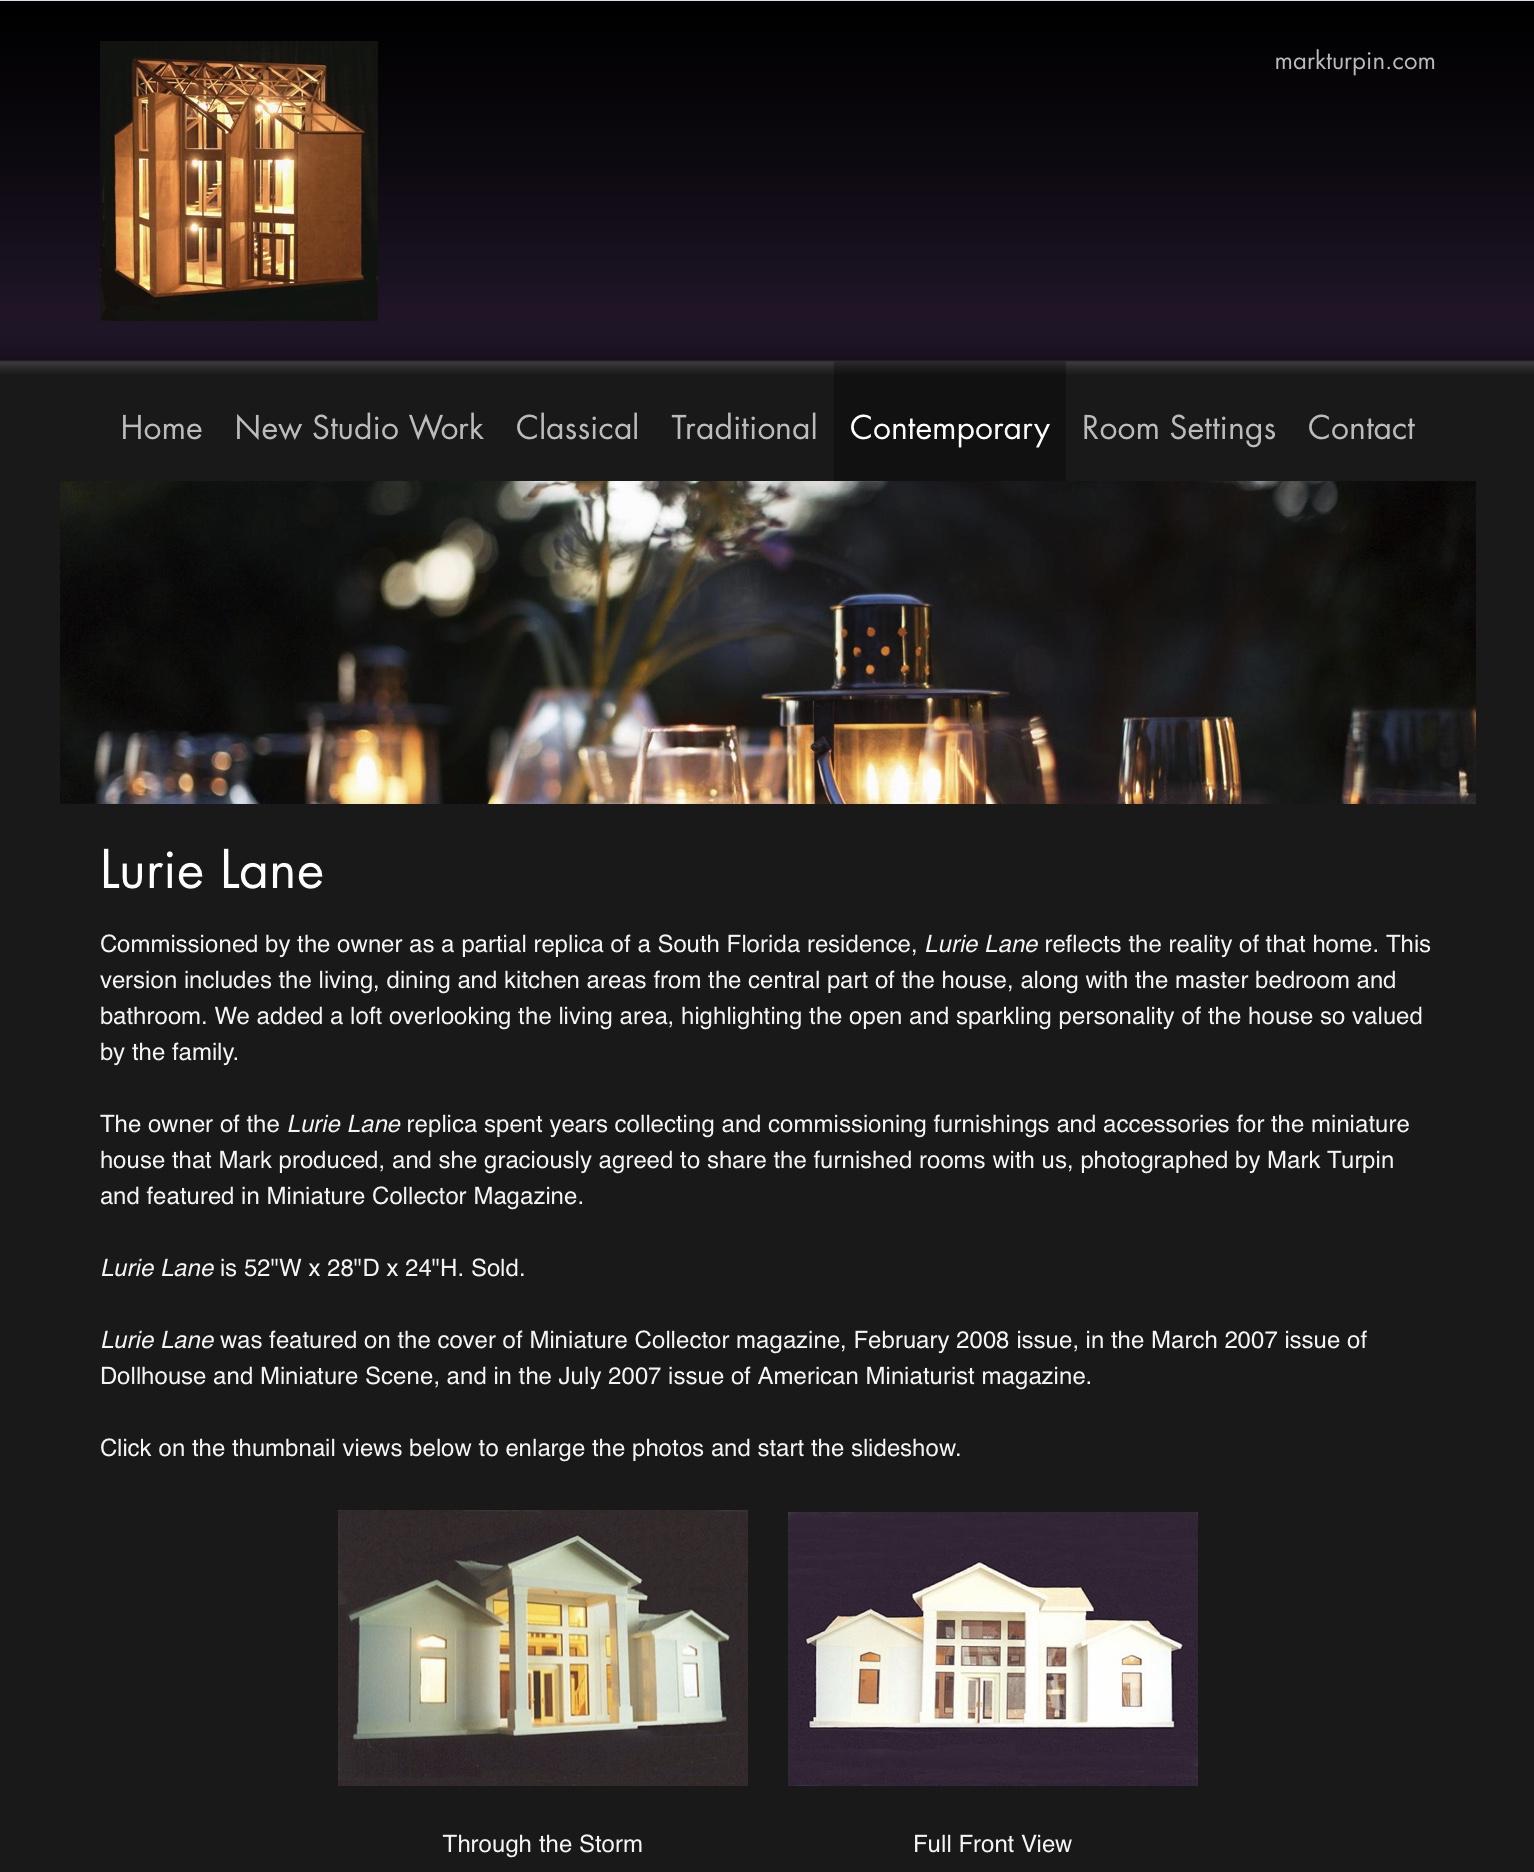 Lurie Lane — 2001